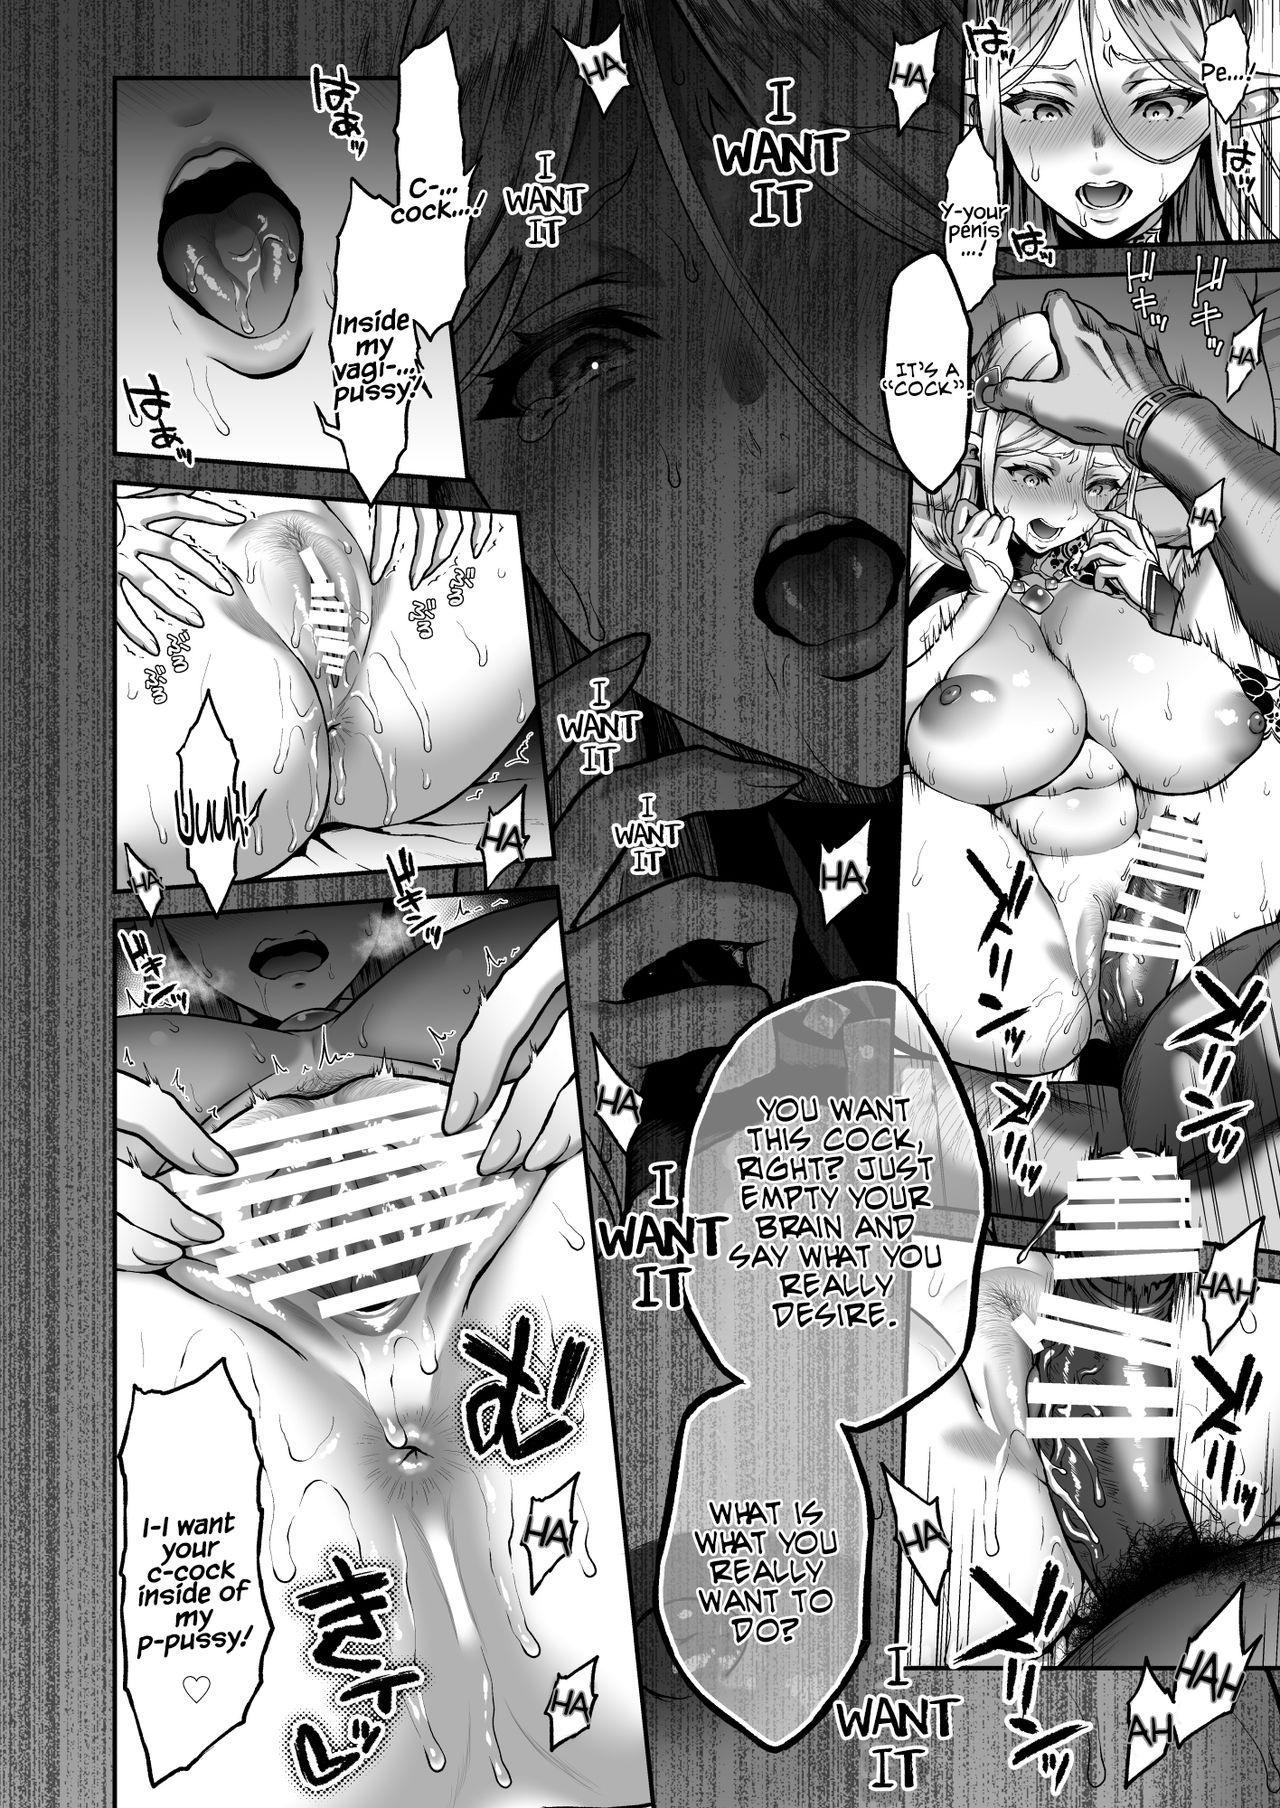 Tasogare no Shou Elf 5 | The Melancholy of the Prostitute Elf 5 24